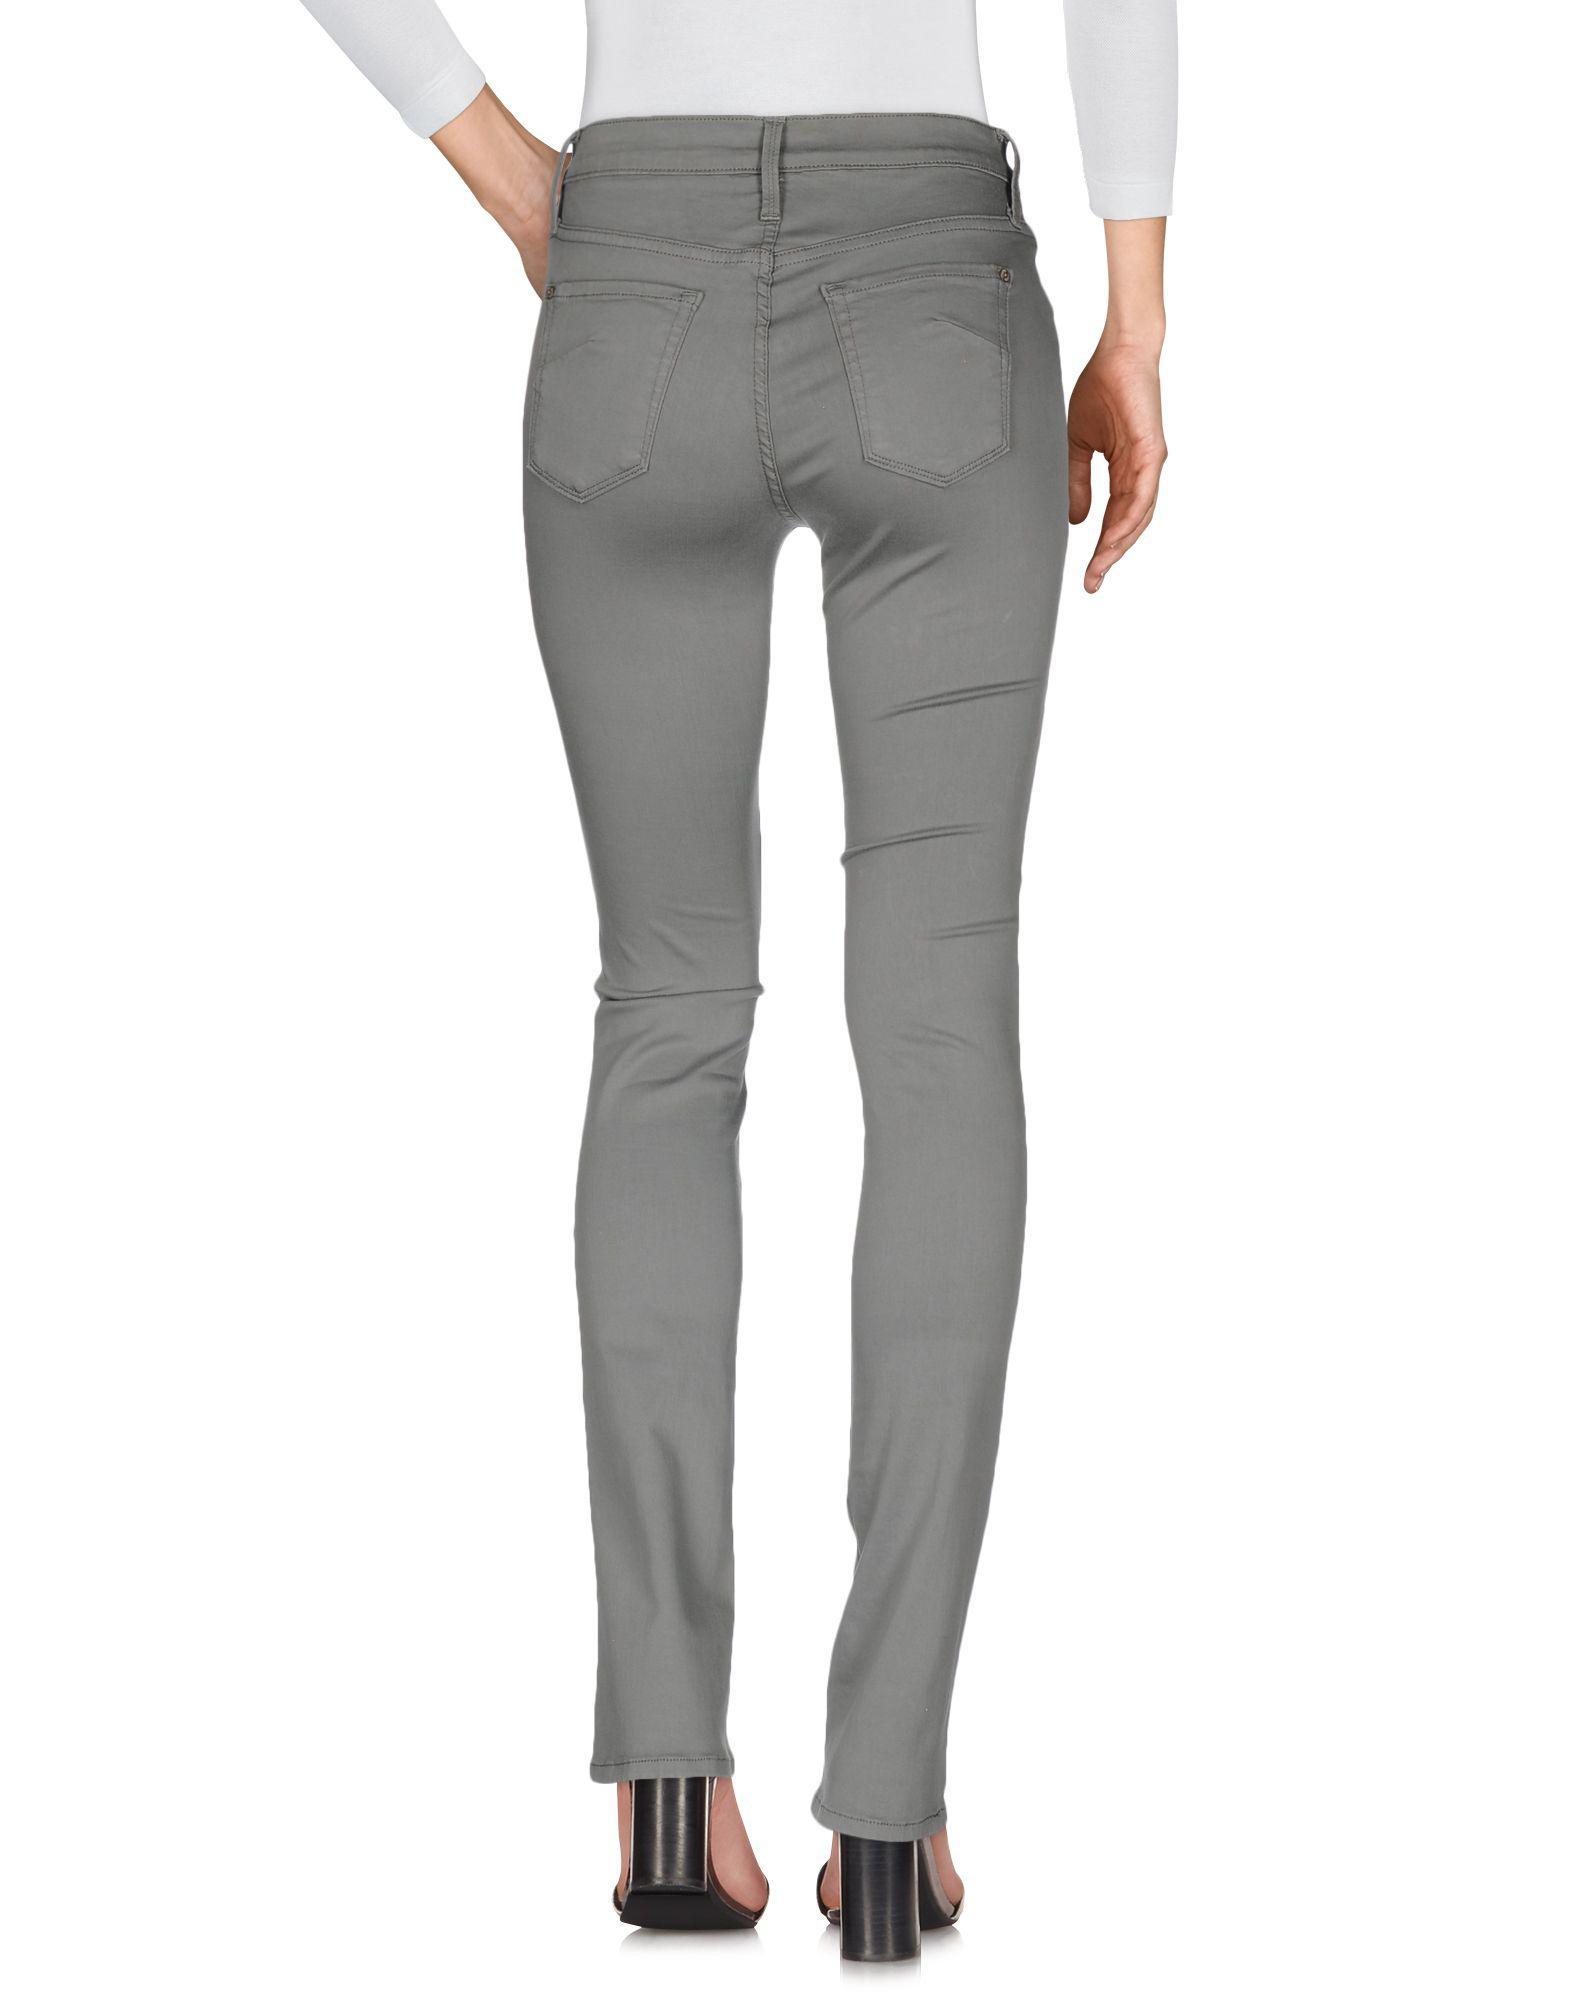 James Jeans Denim Pants in Grey (Grey)